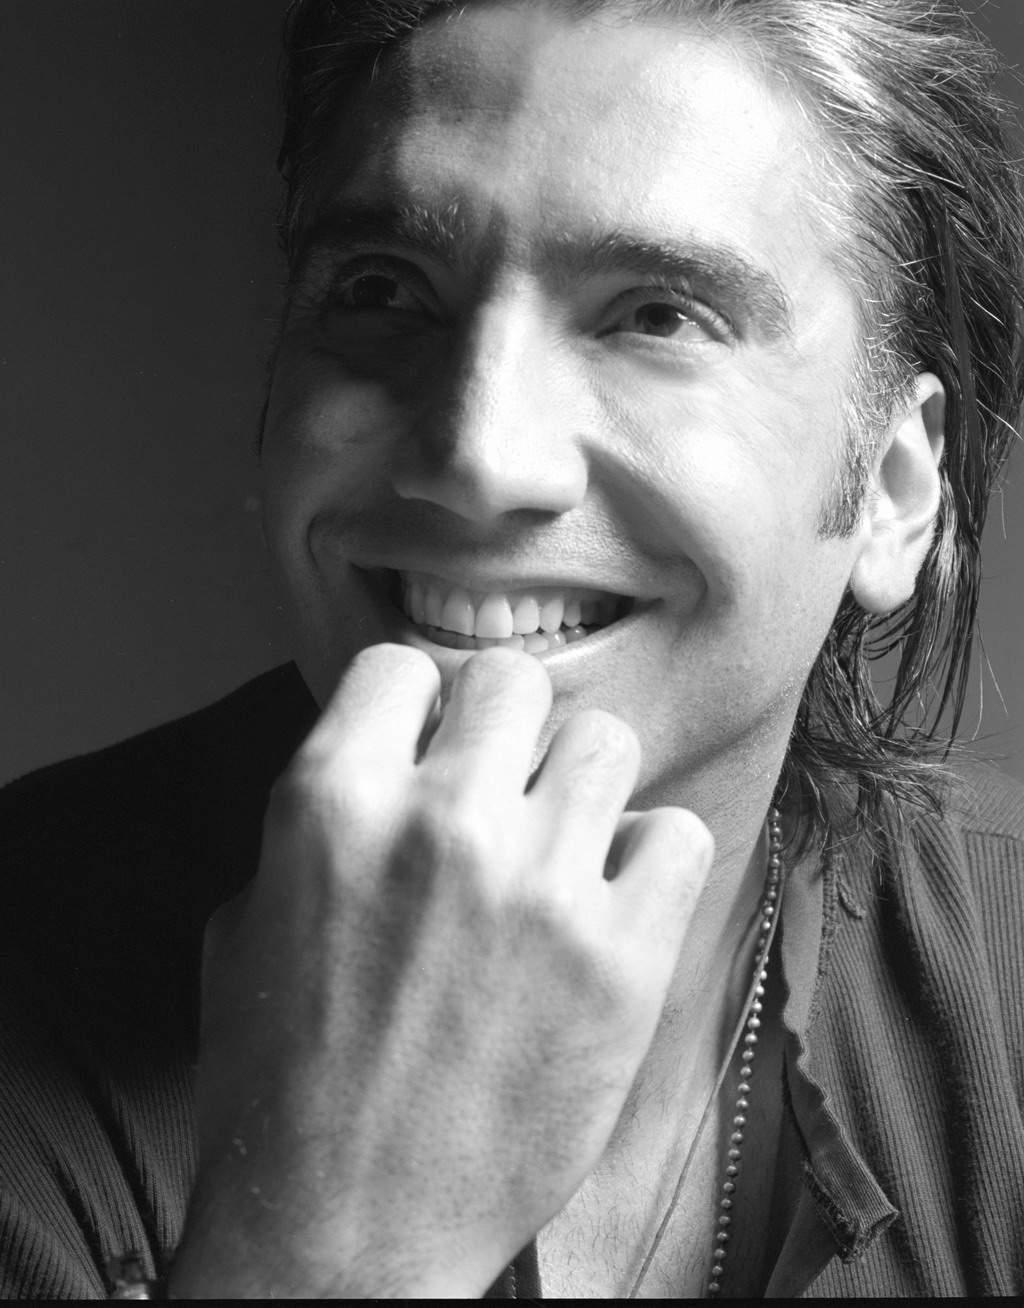 Alejandro sanz online gratis descargar musica de share for Alejandro fernandez en el jardin mp3